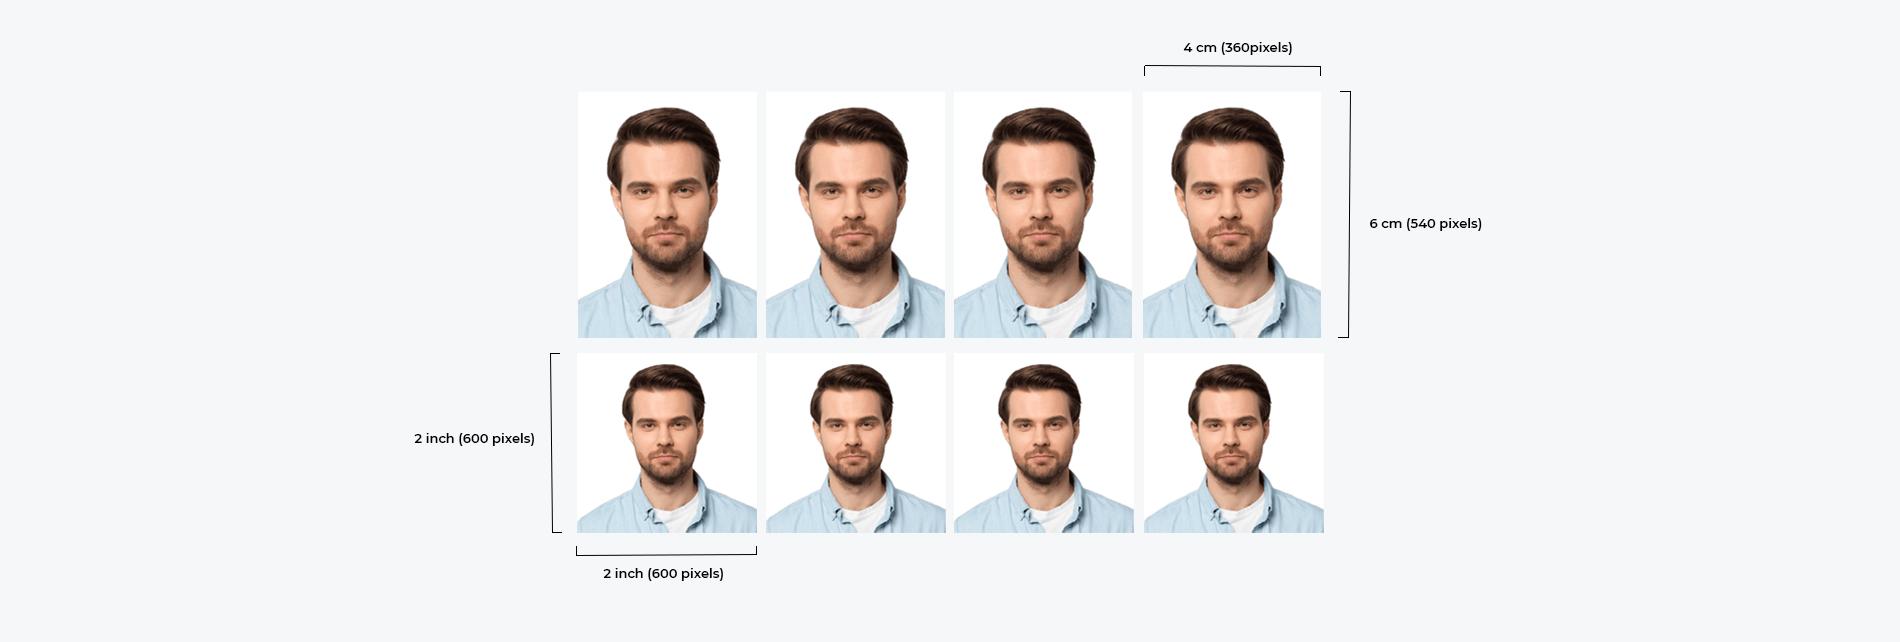 passport picture editor tip 1